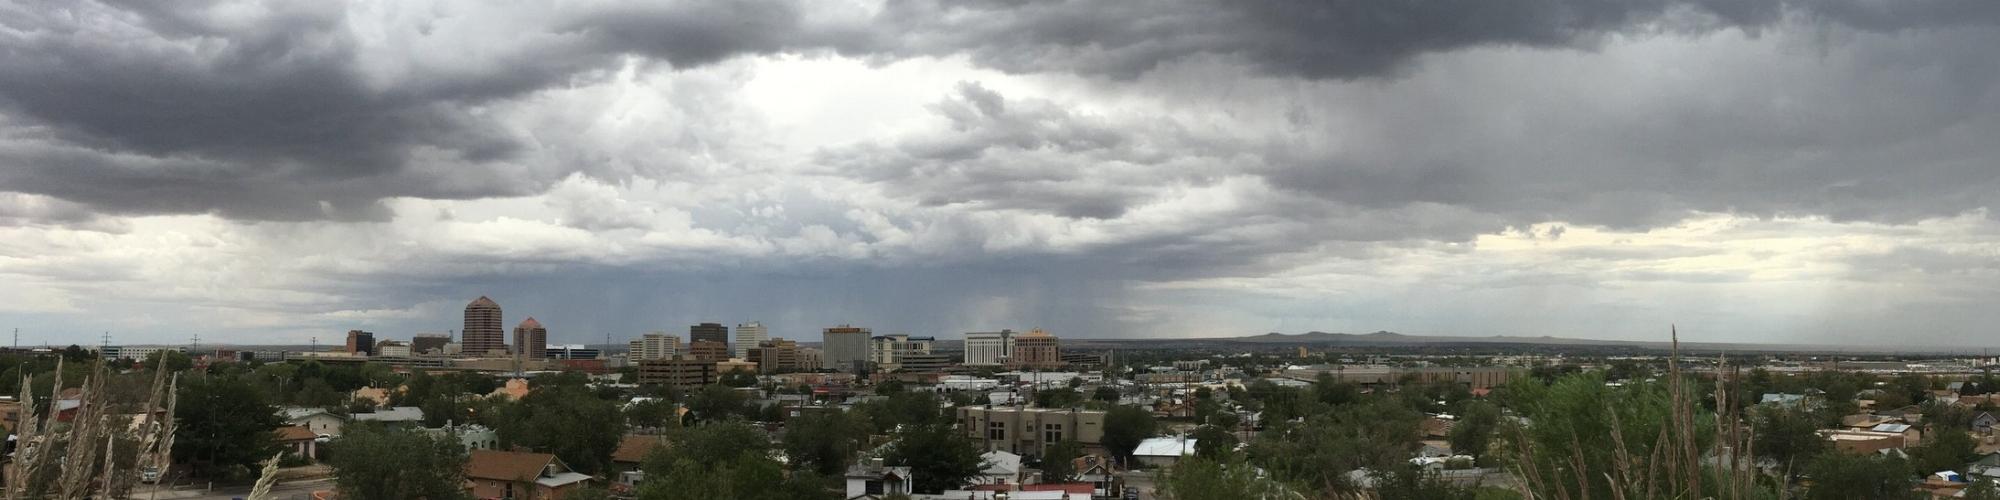 Rain over the West Mesa.jpeg